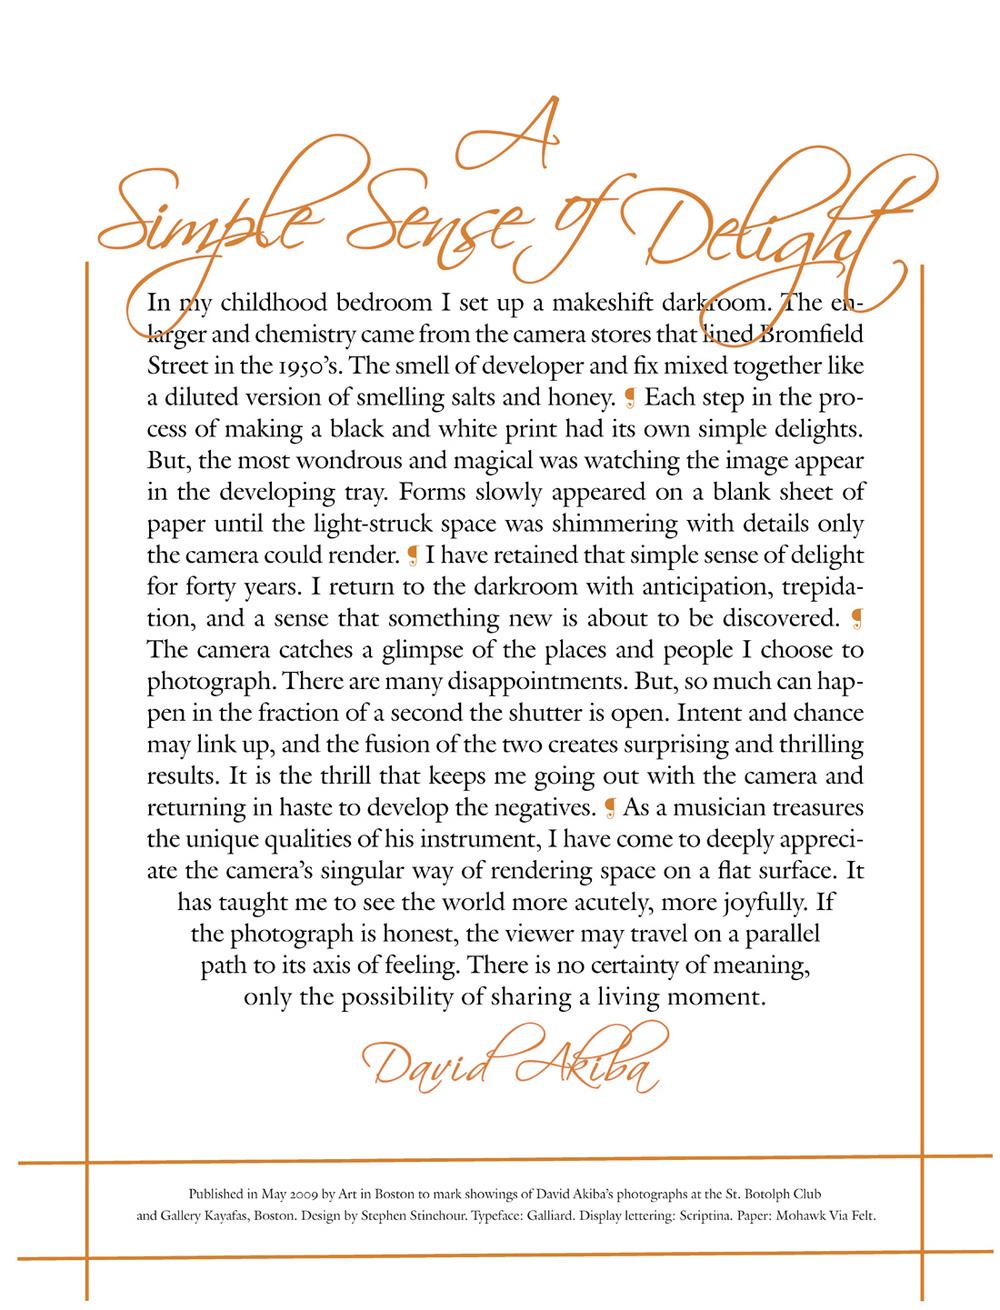 David Akiba, A Sense of Delight